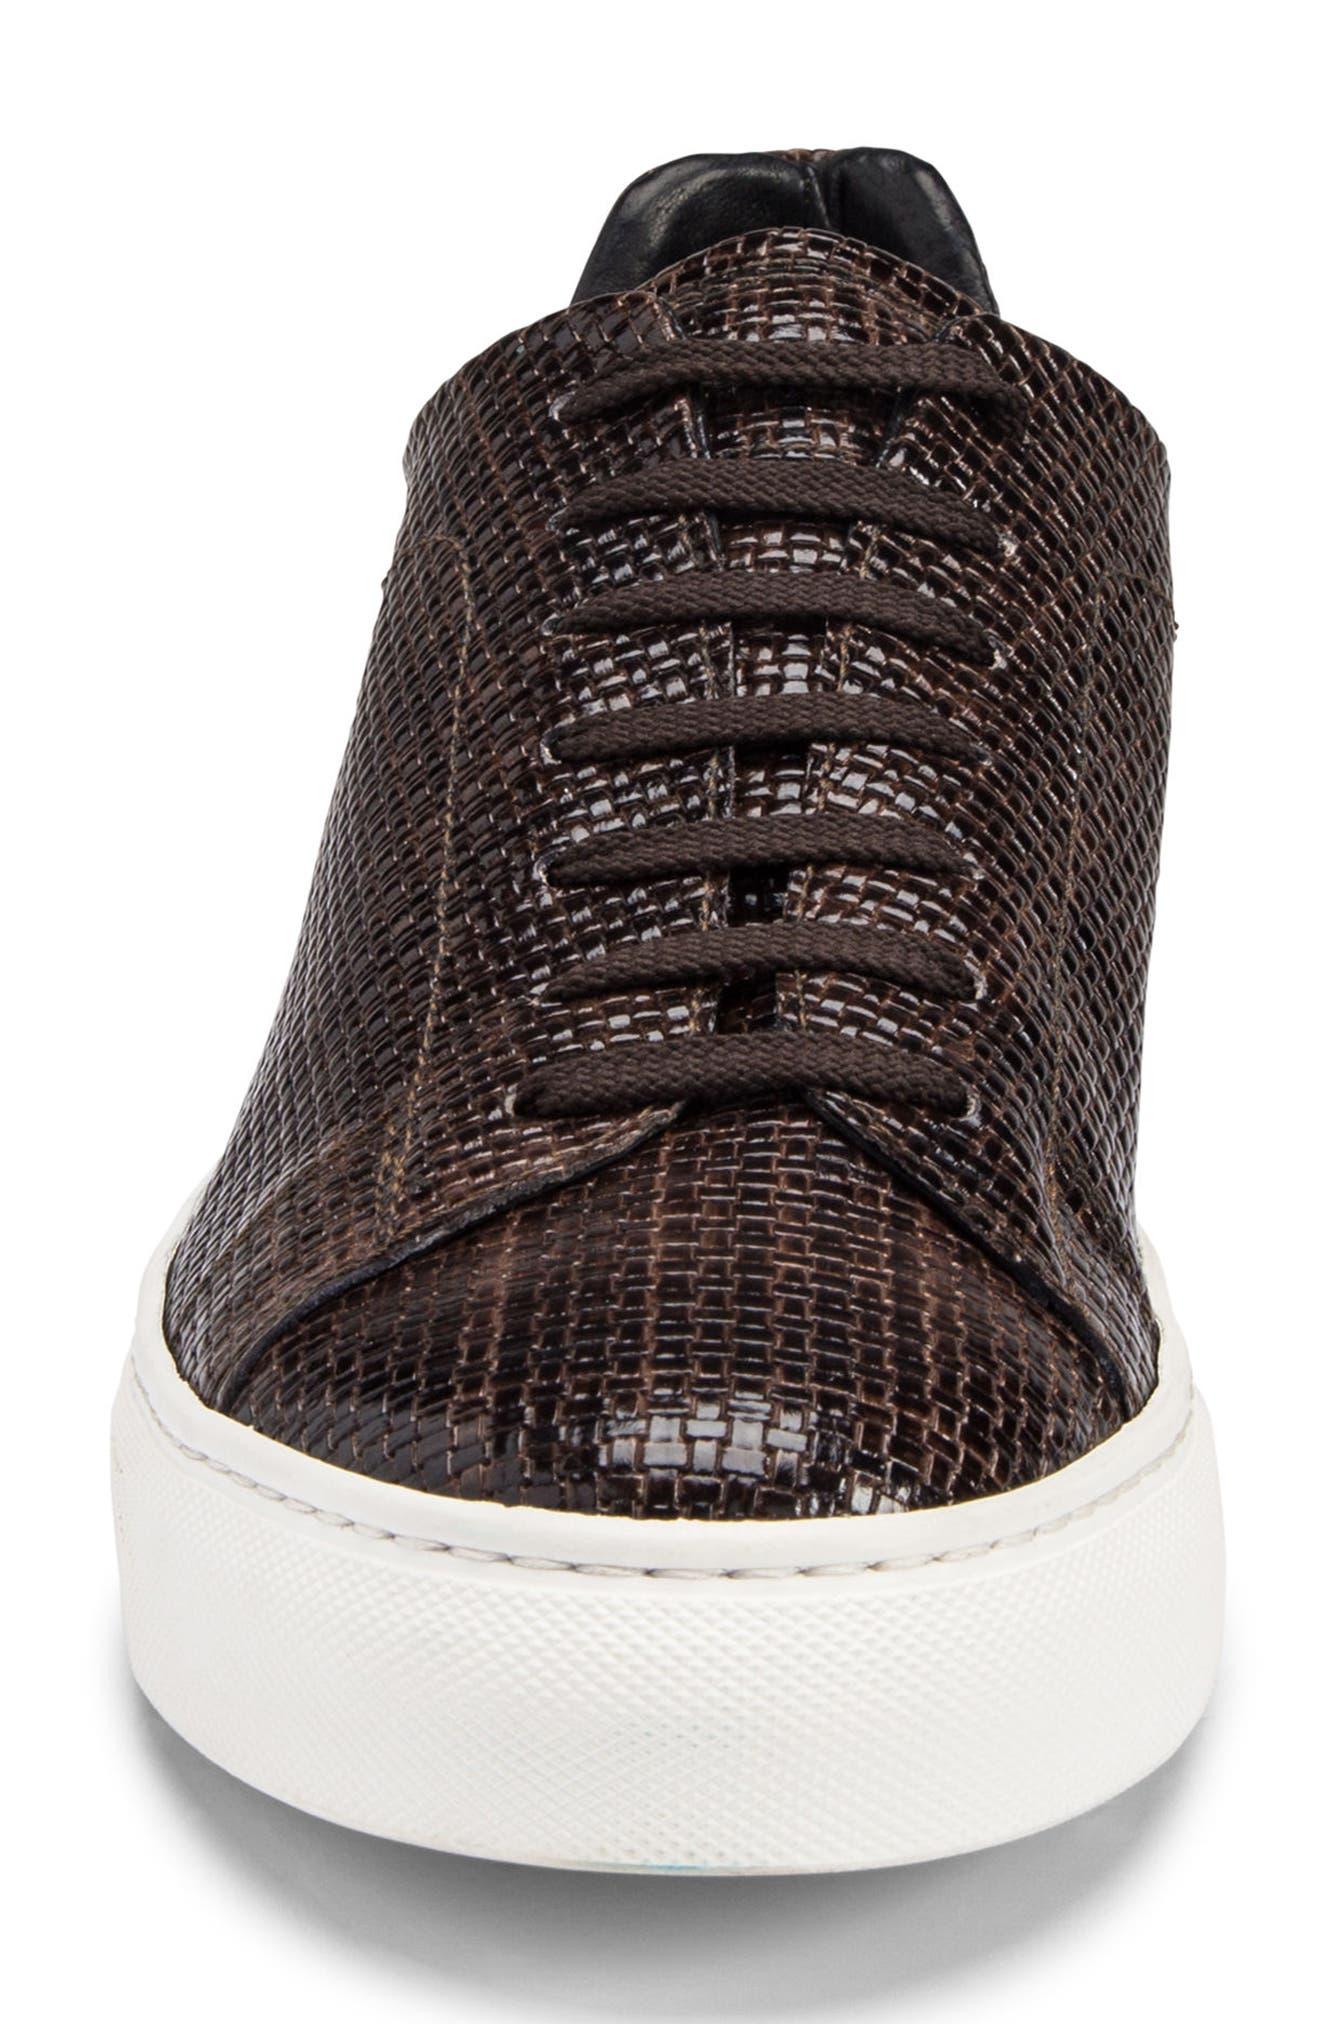 Wimbledon Sneaker,                             Alternate thumbnail 4, color,                             TESTA DI MORO